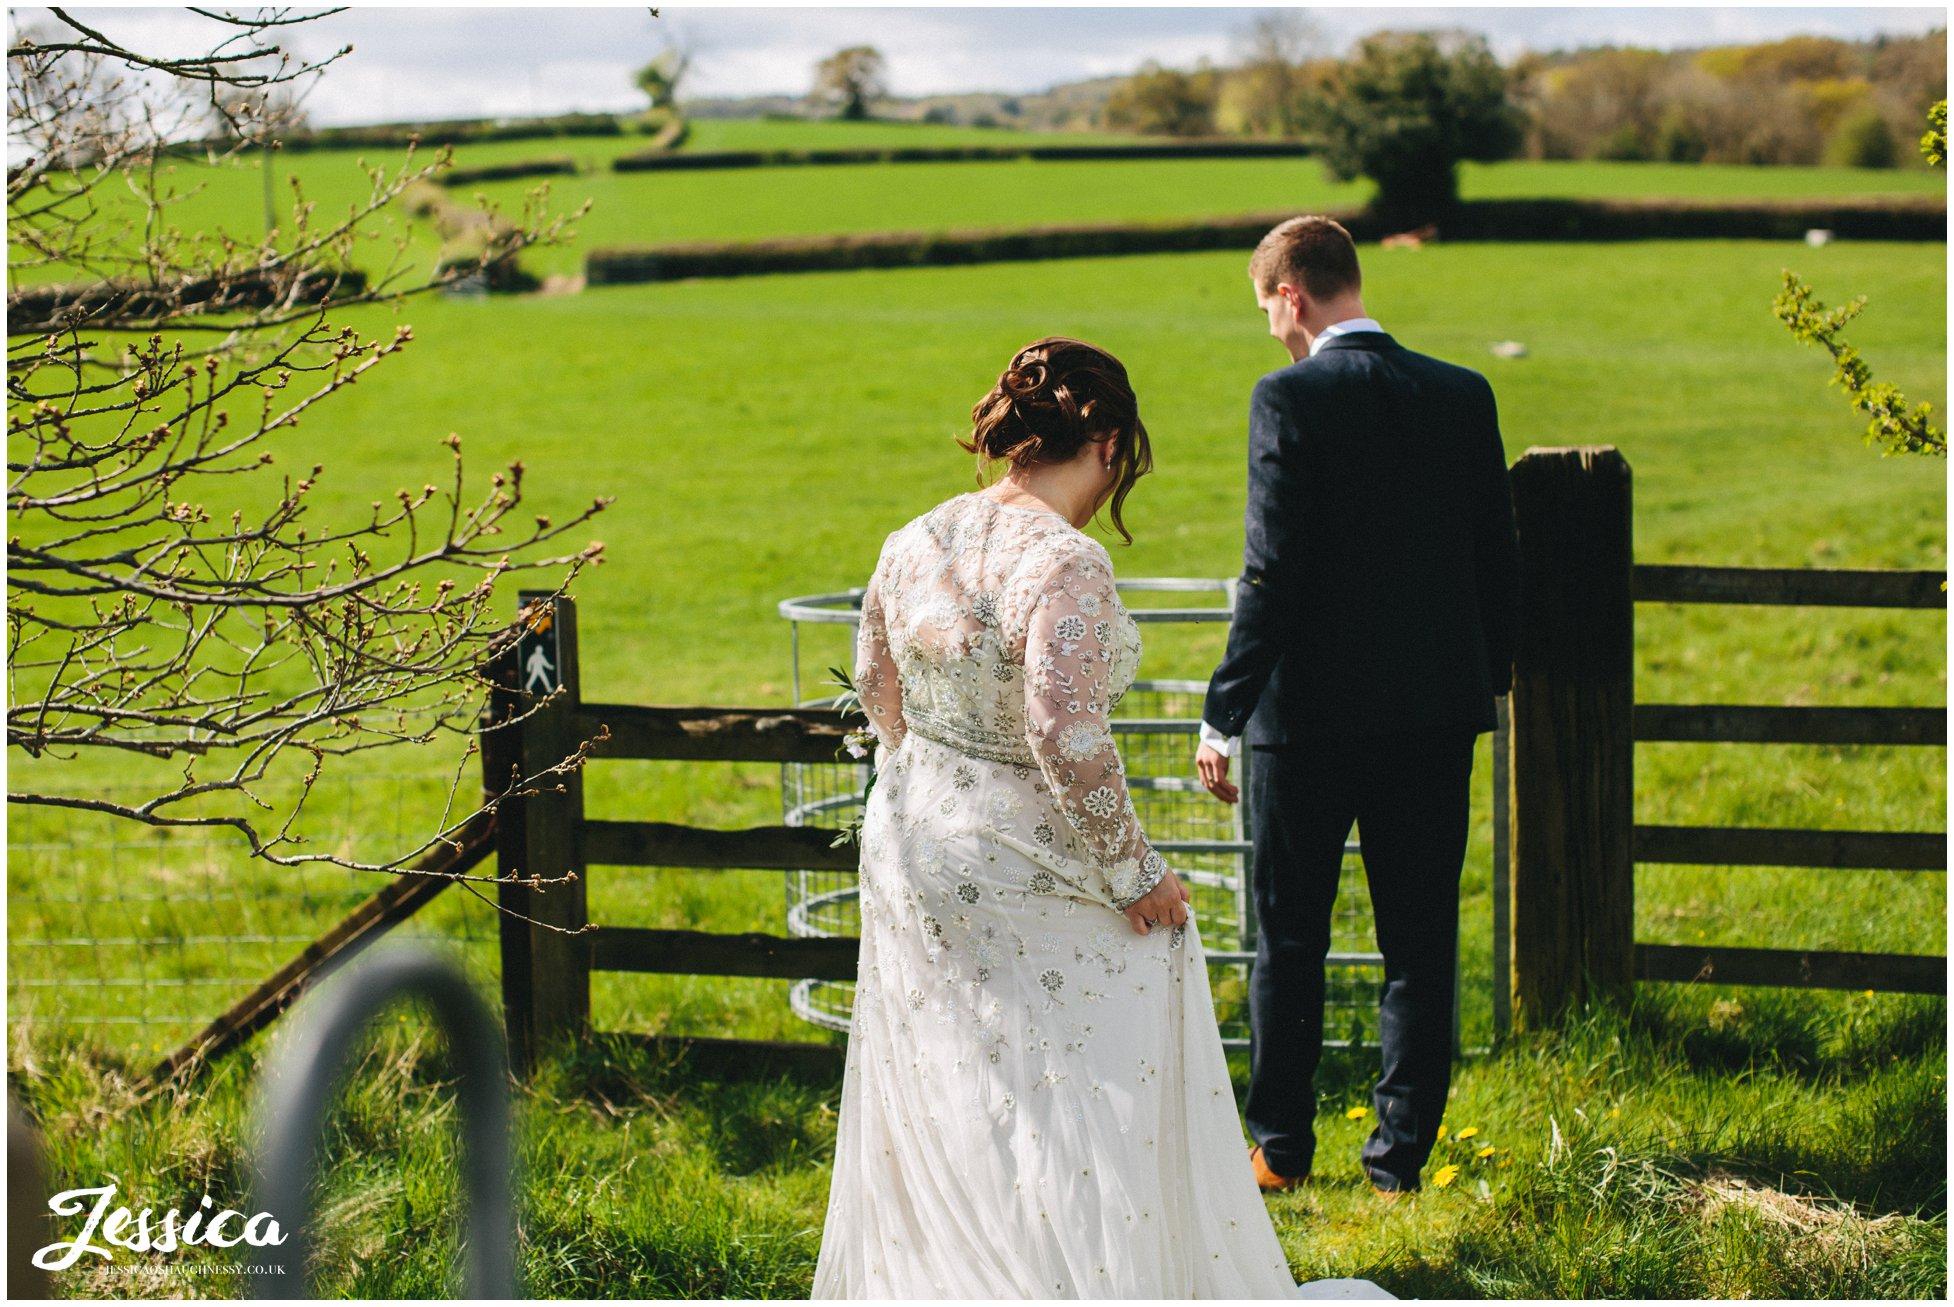 newly wed's walk through gates into field